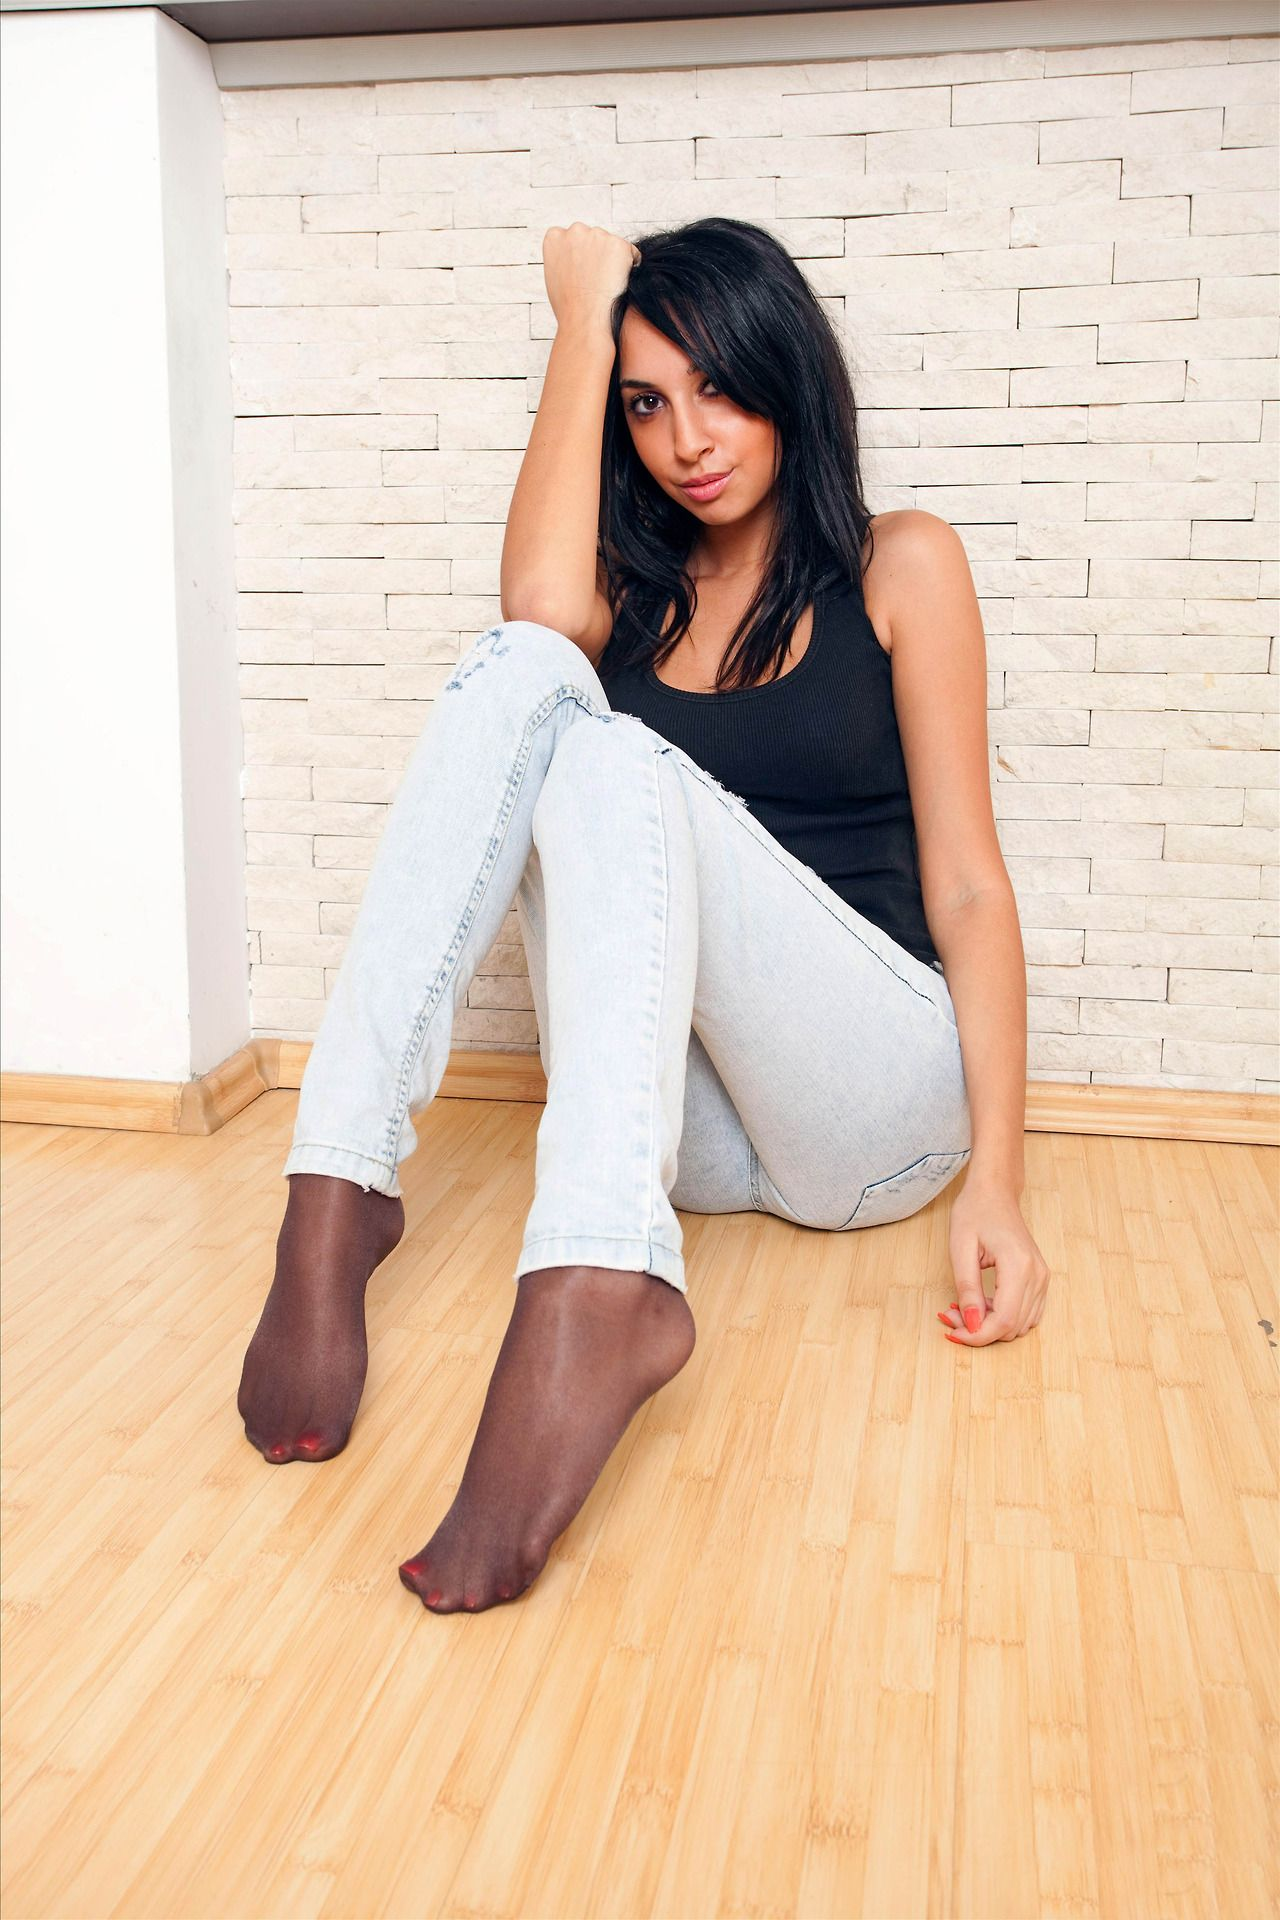 Legs.bz Nylon Legs Stockings And Hosiery